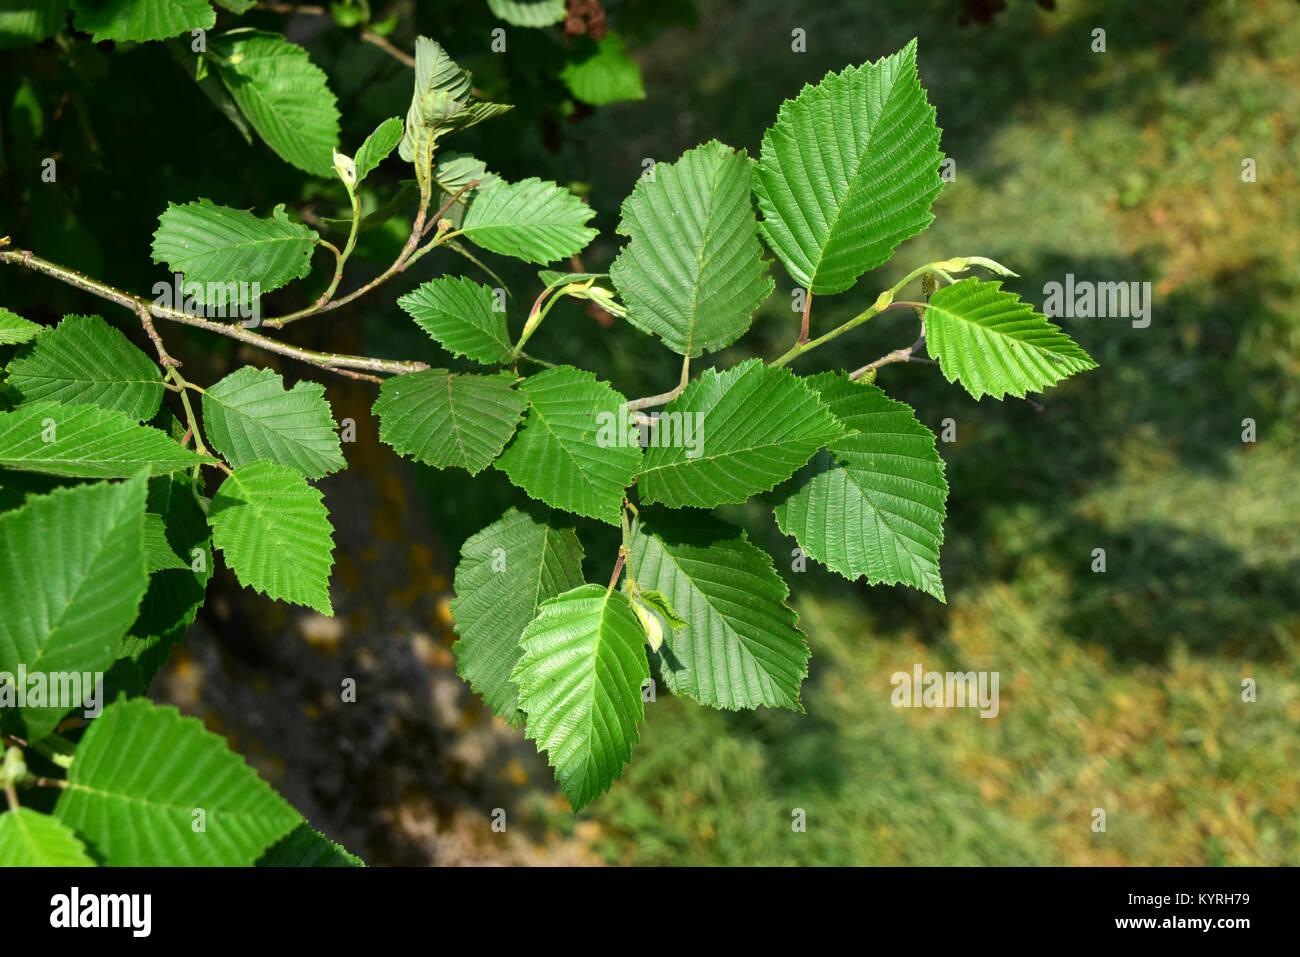 Grey Alder, Gray Elder ( Alnus incana), twig with leaves. - Stock Image